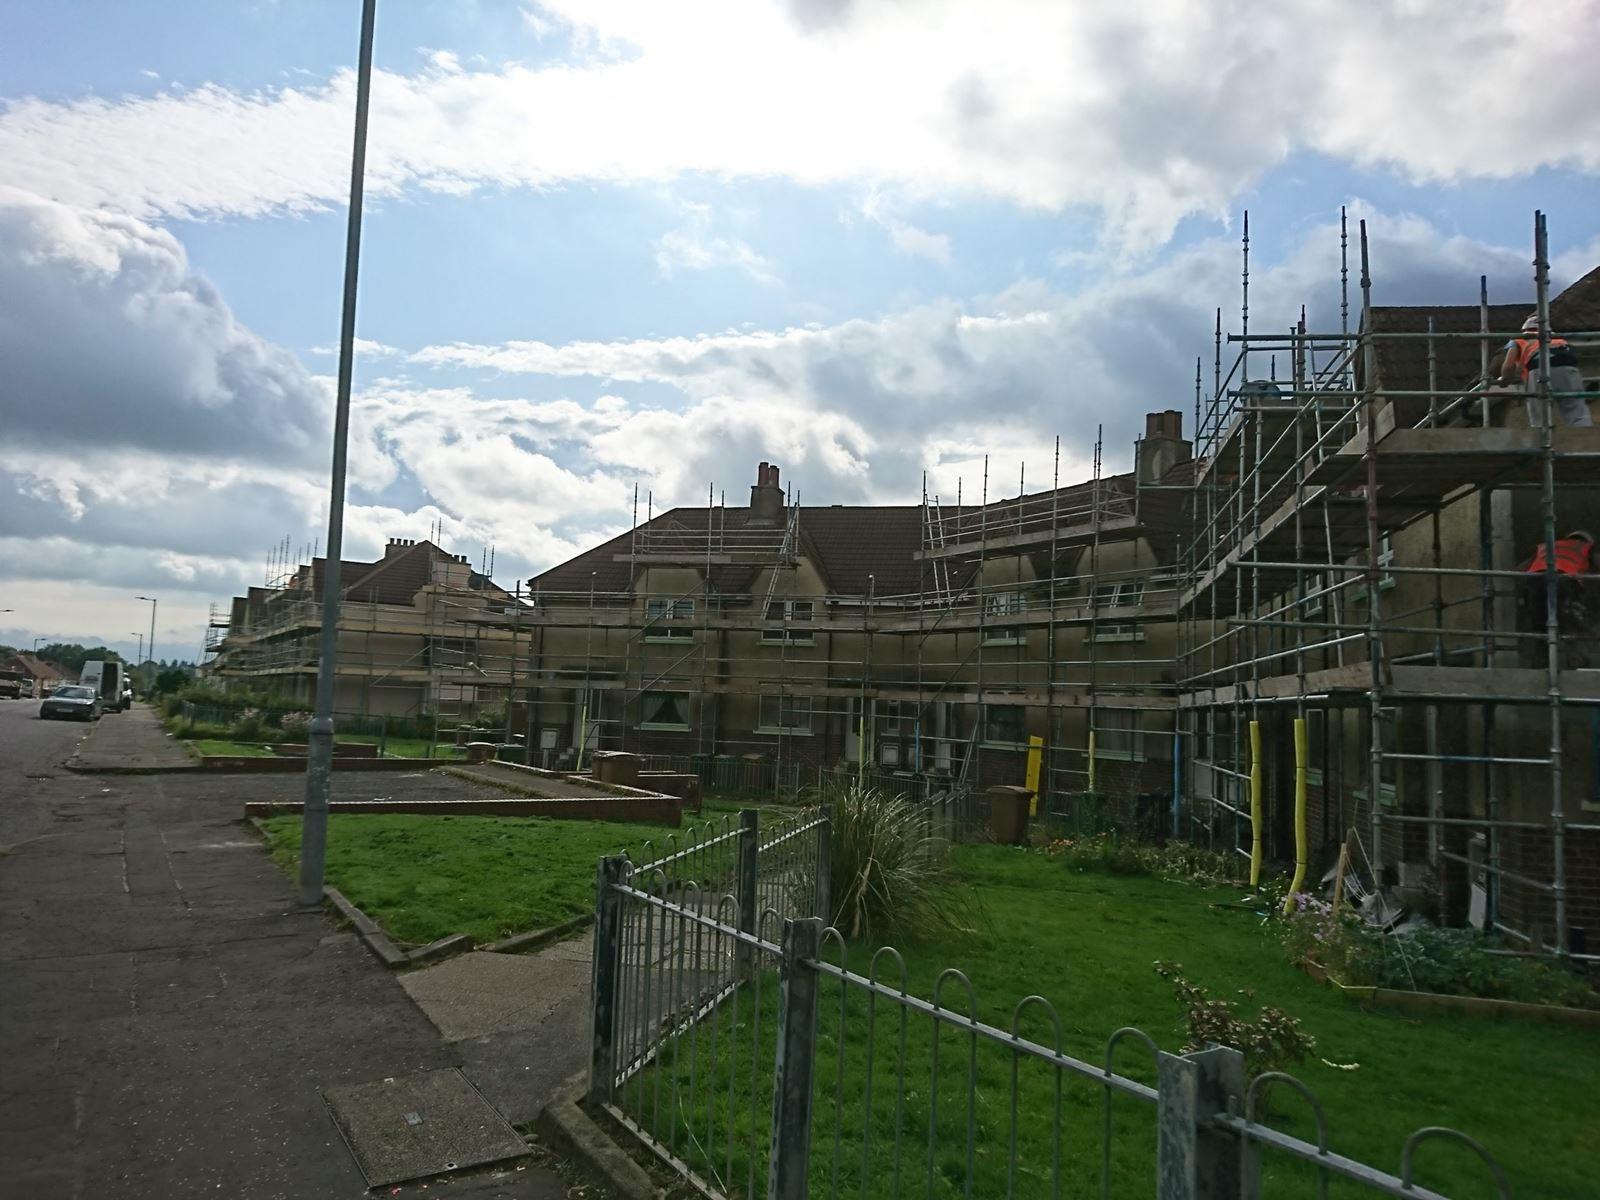 rendering-a-wall-edinburgh-external-render-edinburgh